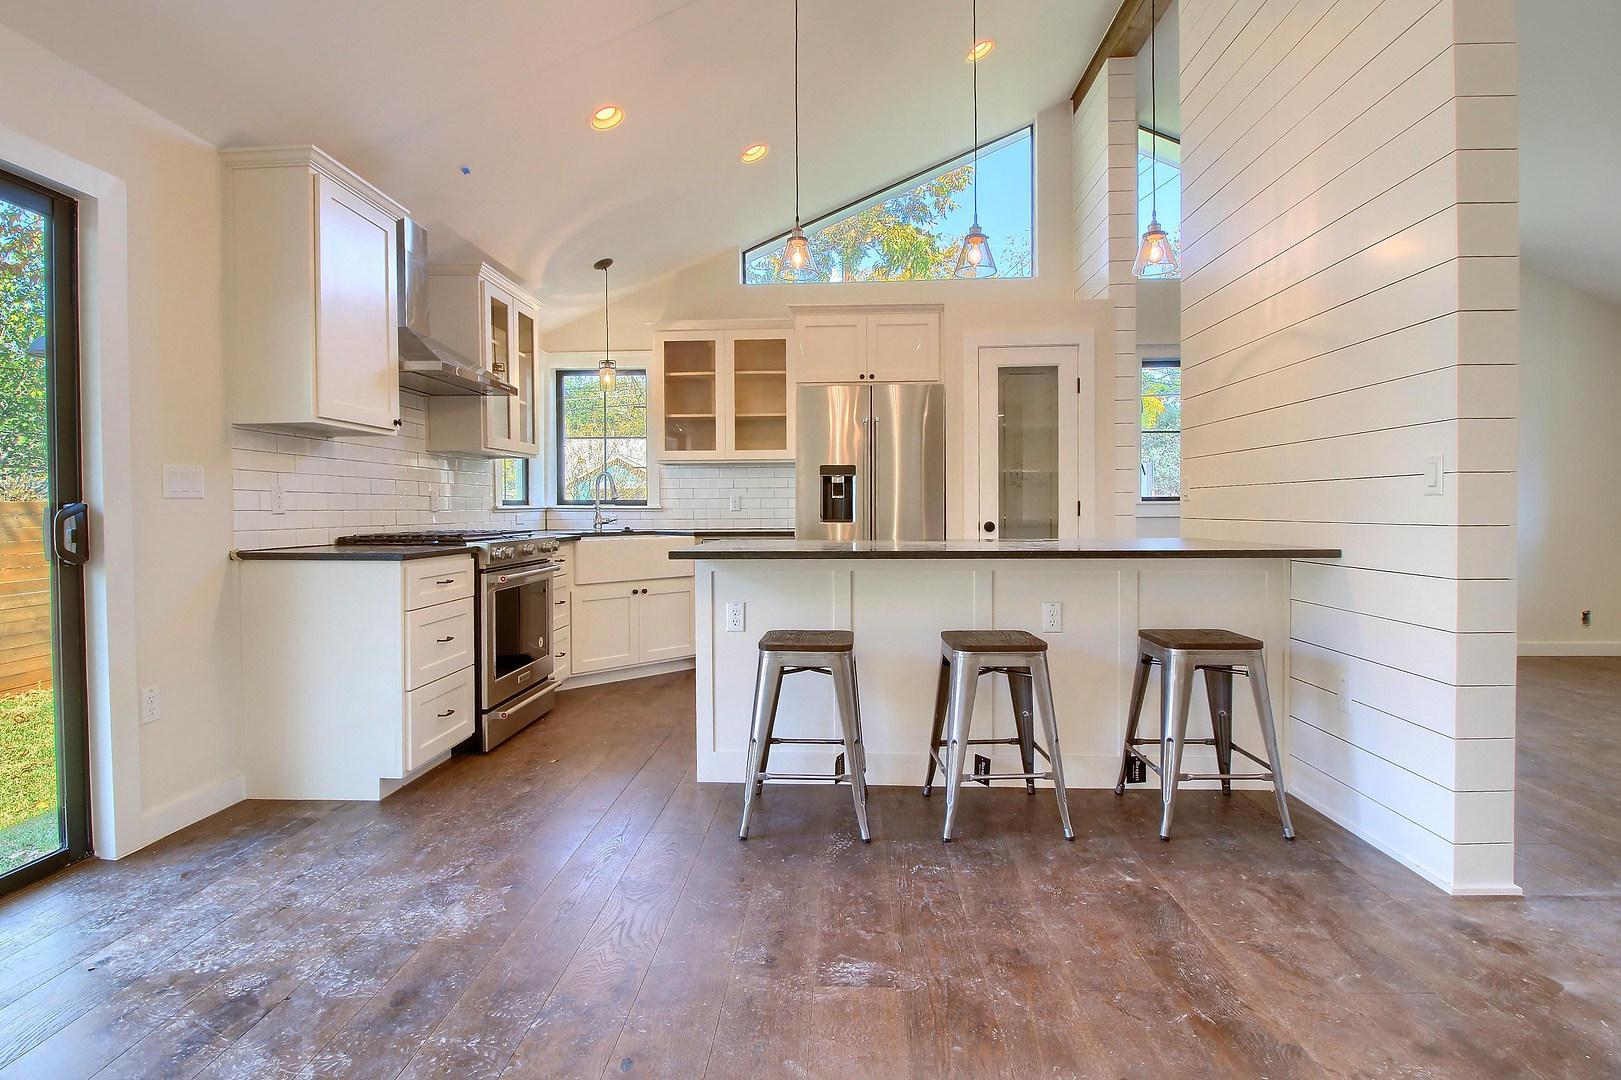 Home Renovation Kitchen on Bouldin in Austin, TX